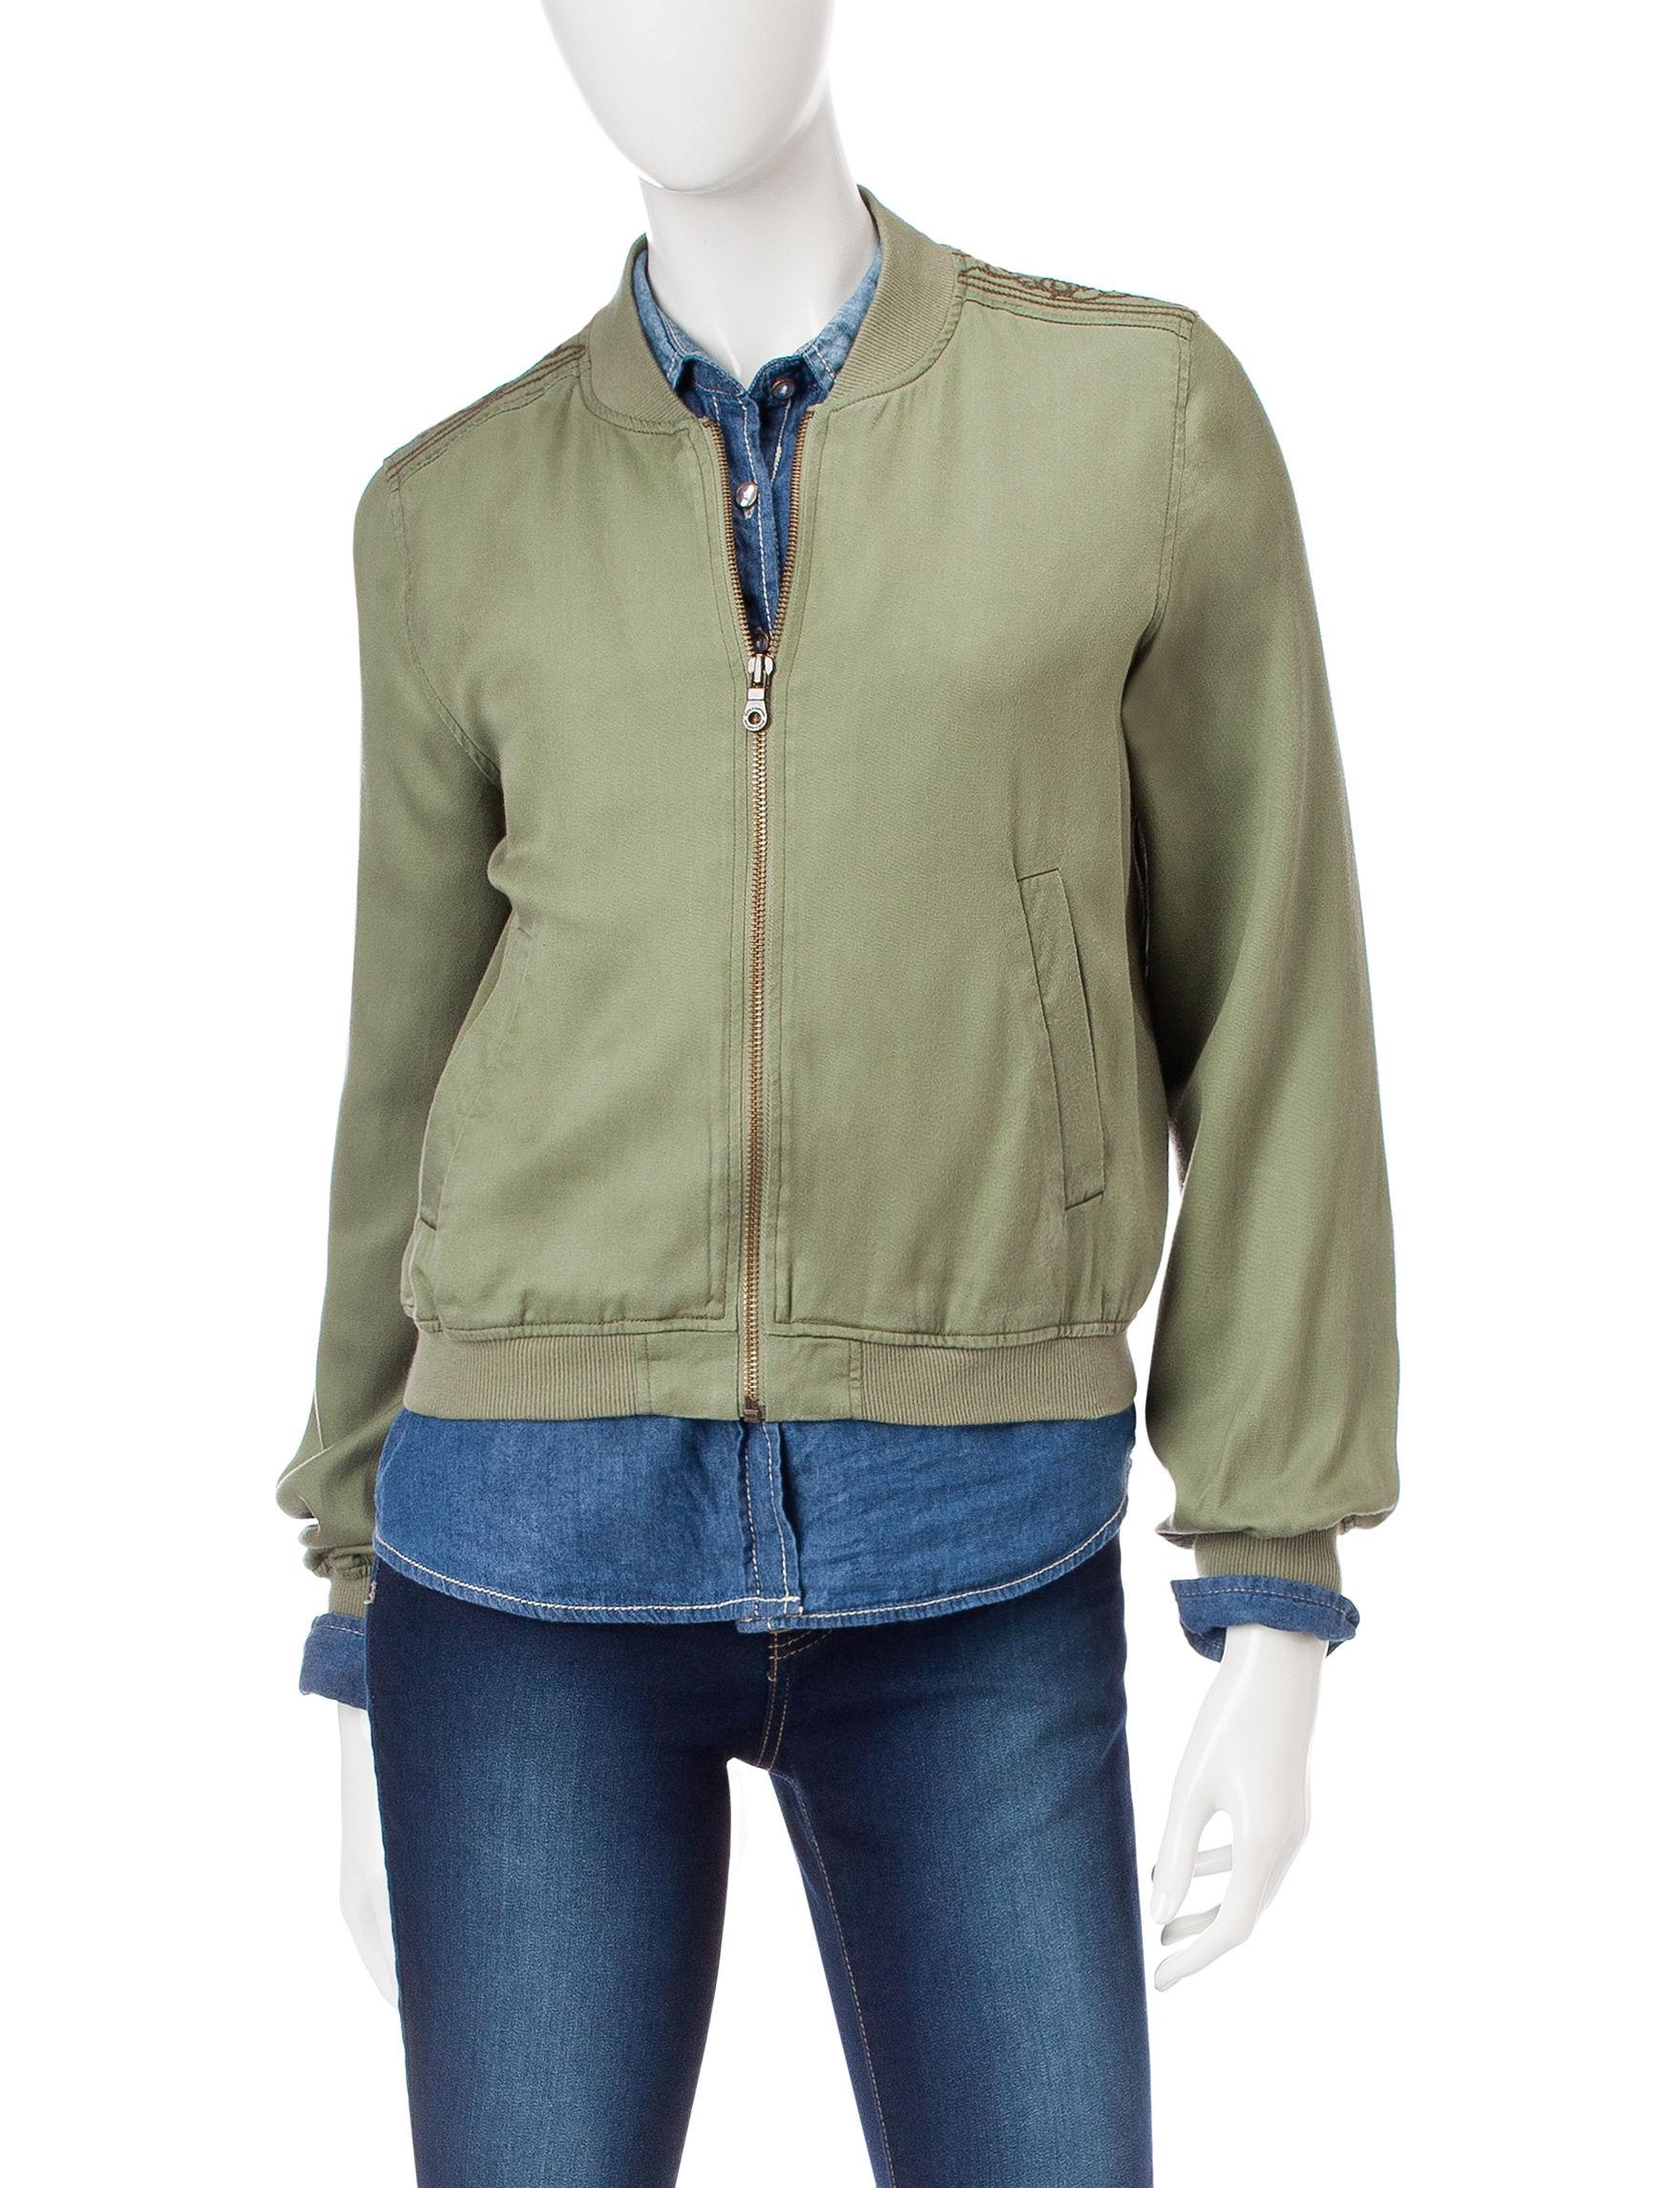 Jessica Simpson Green Bomber & Moto Jackets